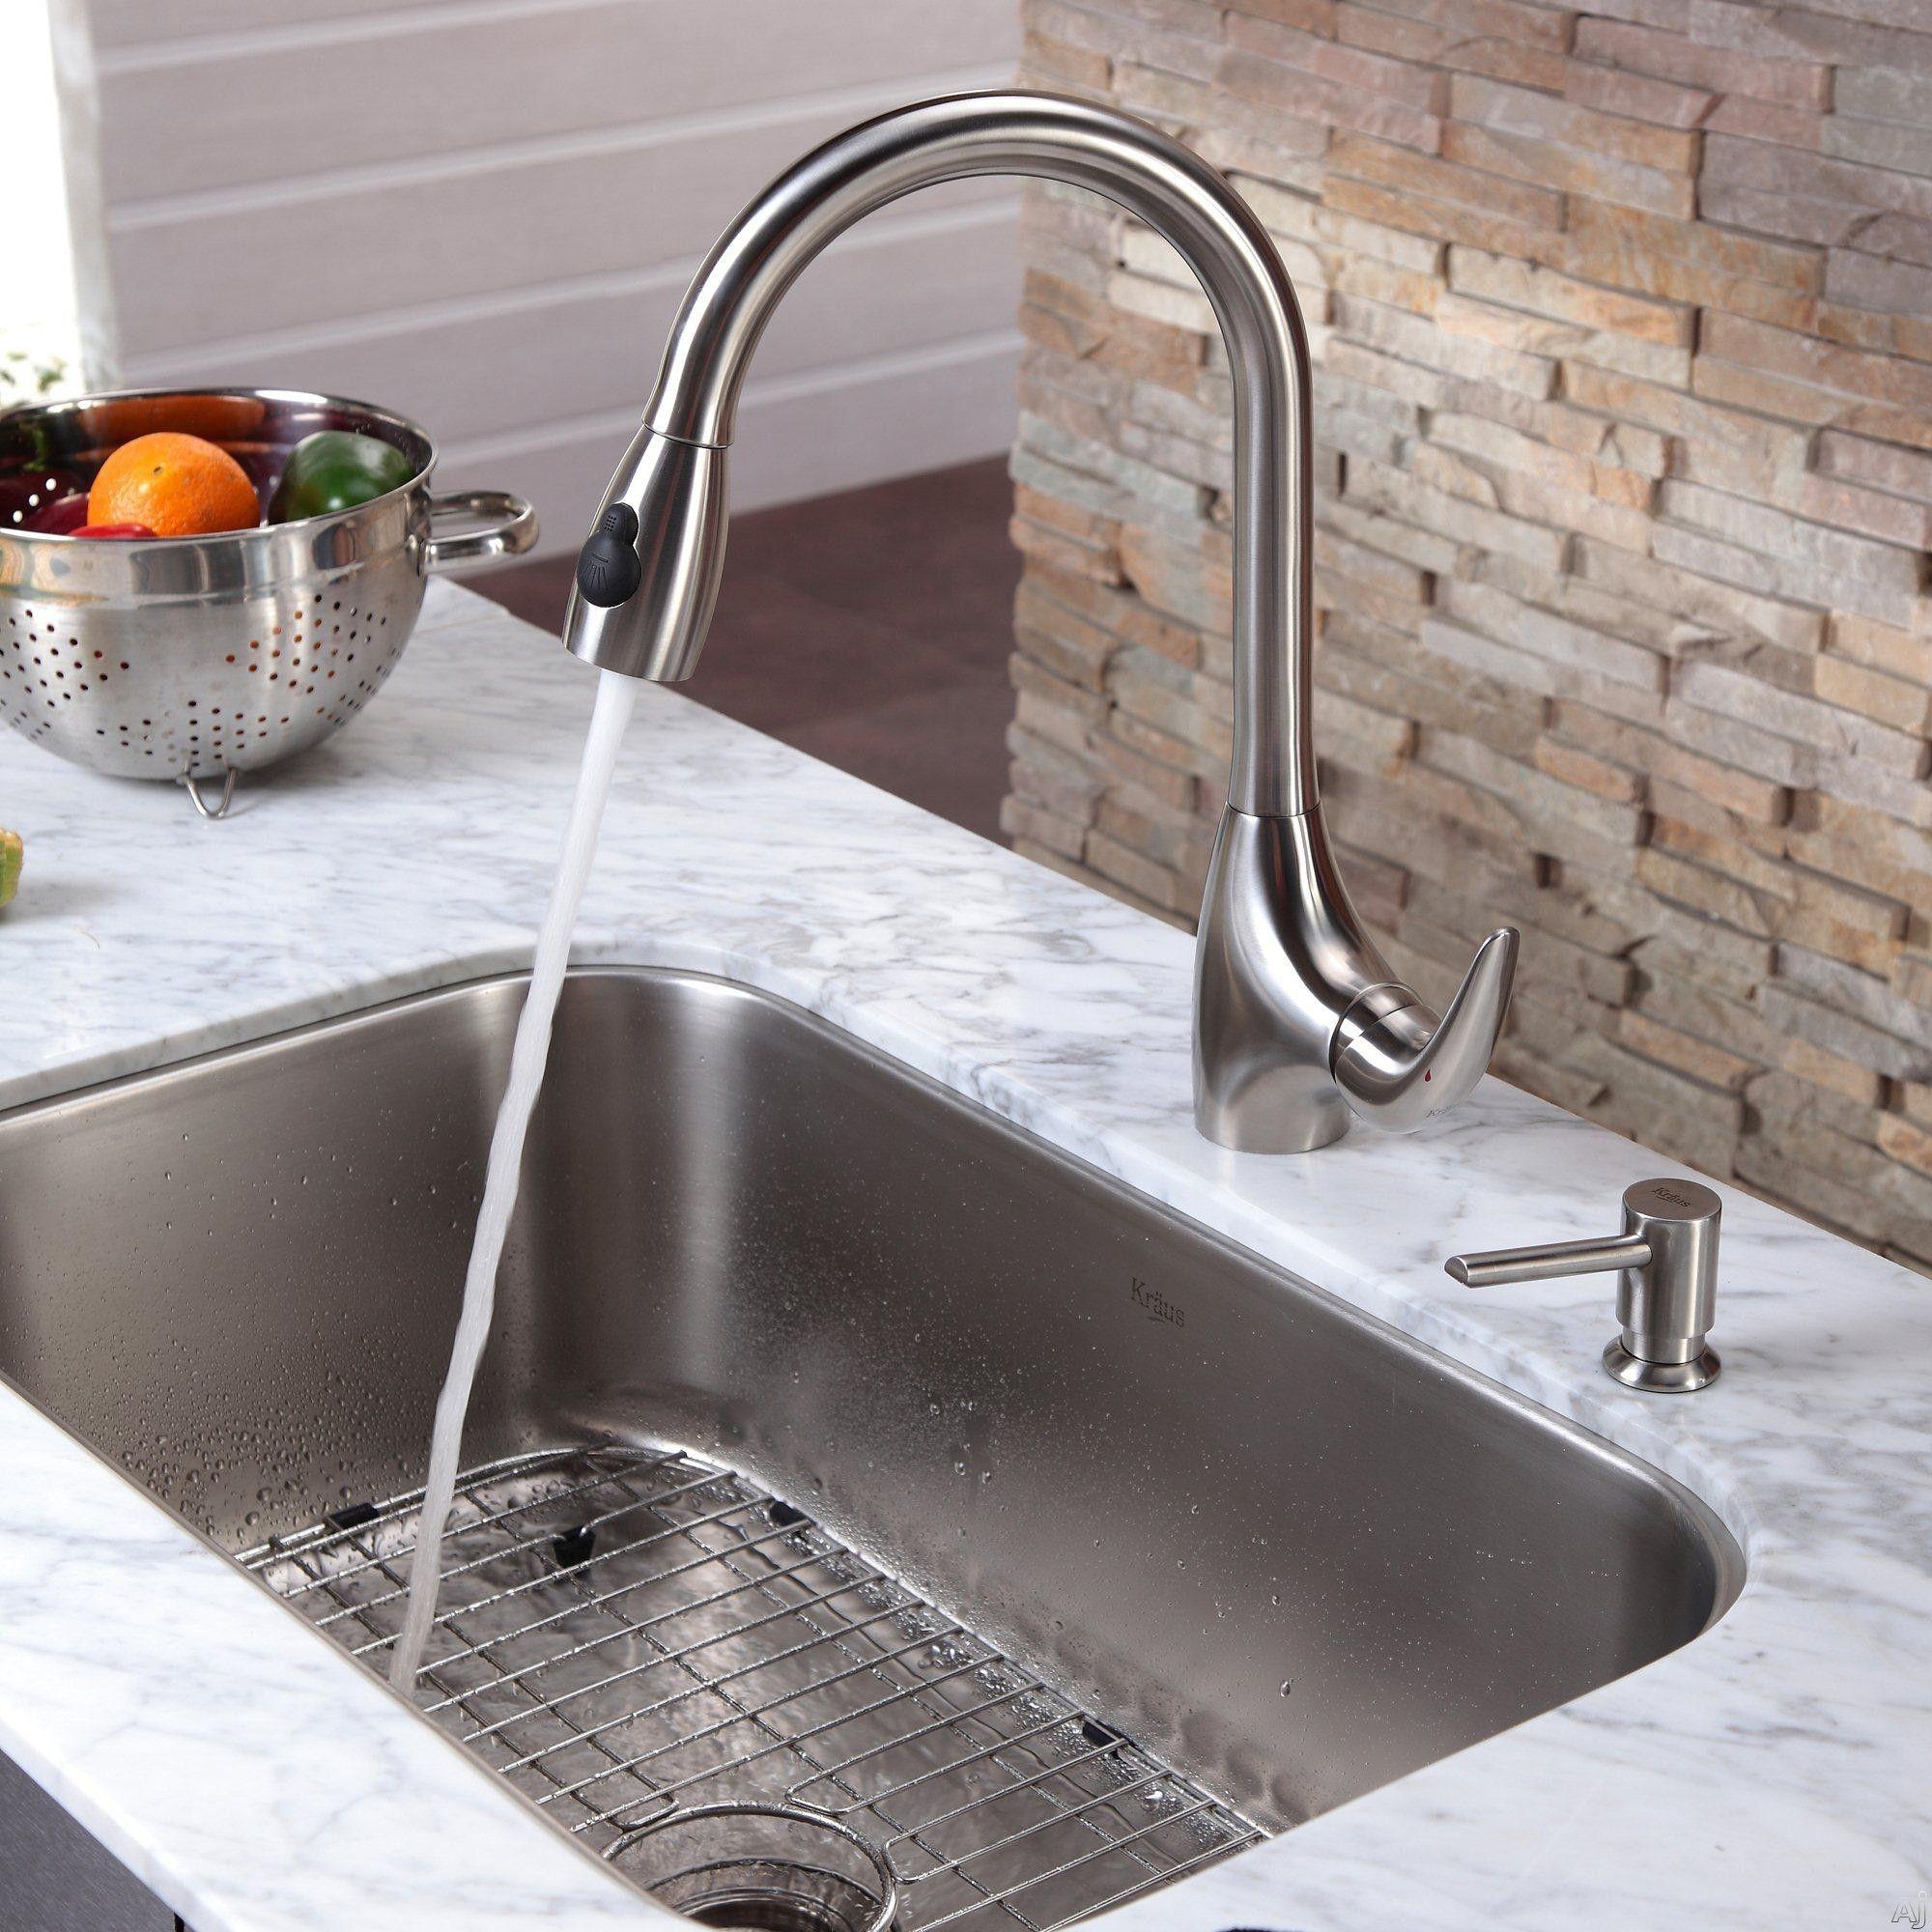 Raghunath Steels is the kitchen sinks Manufacturer in Delhi and ...